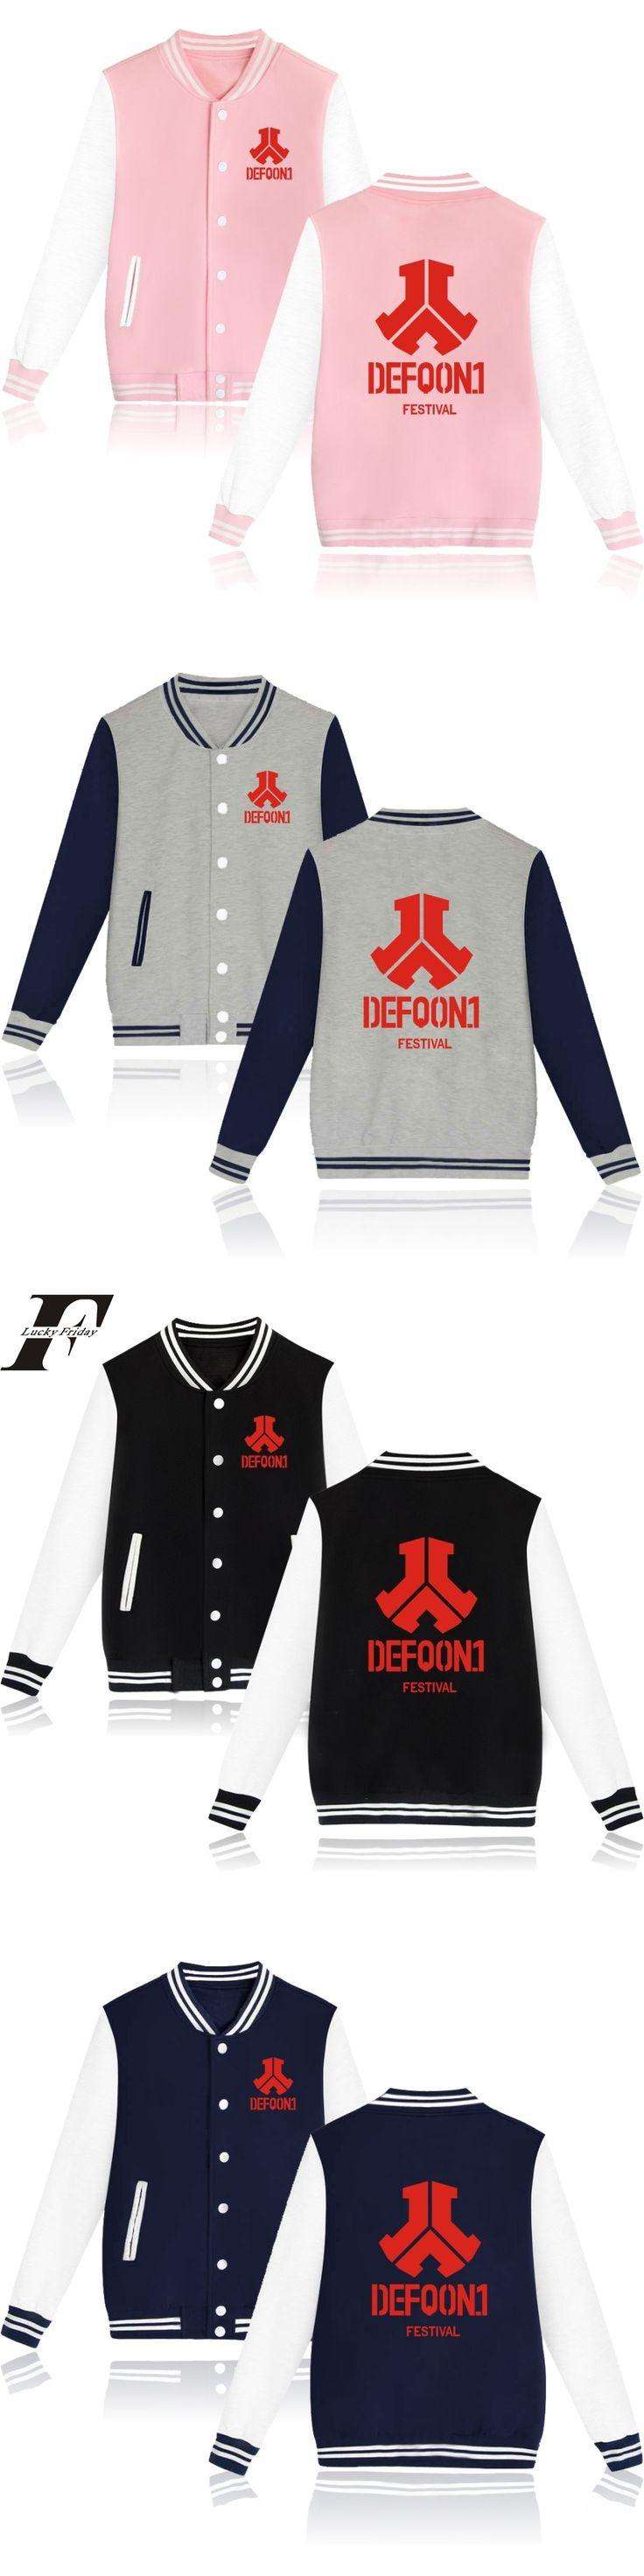 winter jacket men bomber Jacket Defqon 1 Fashion baseball jackets Men Slipknot with button fitness jacket softshell 4XL